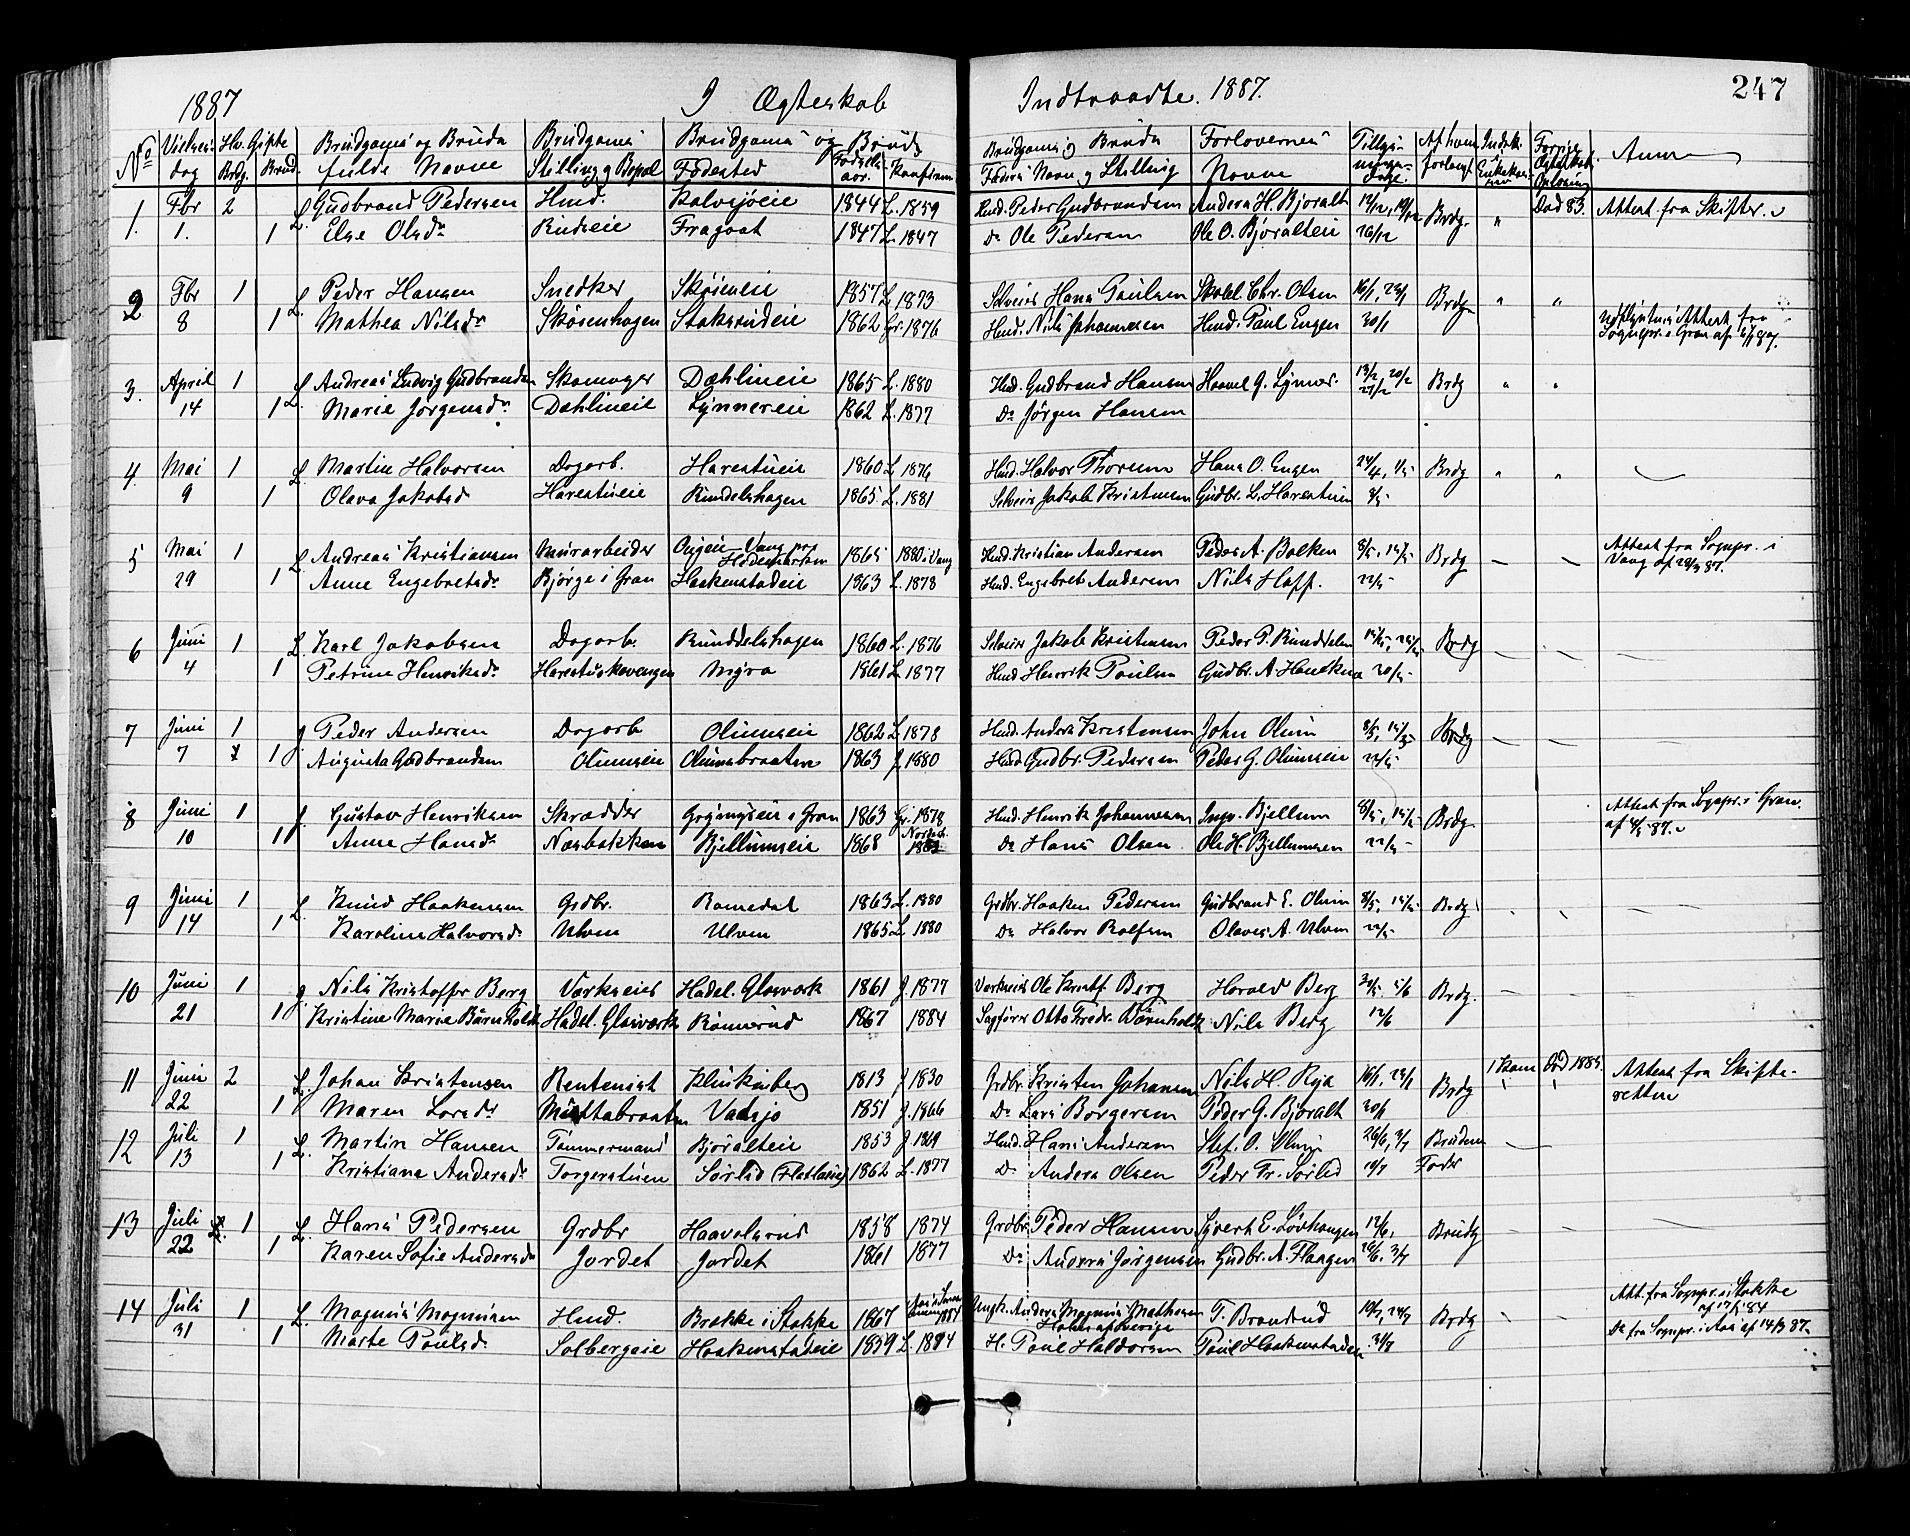 SAH, Jevnaker prestekontor, Ministerialbok nr. 8, 1877-1890, s. 247